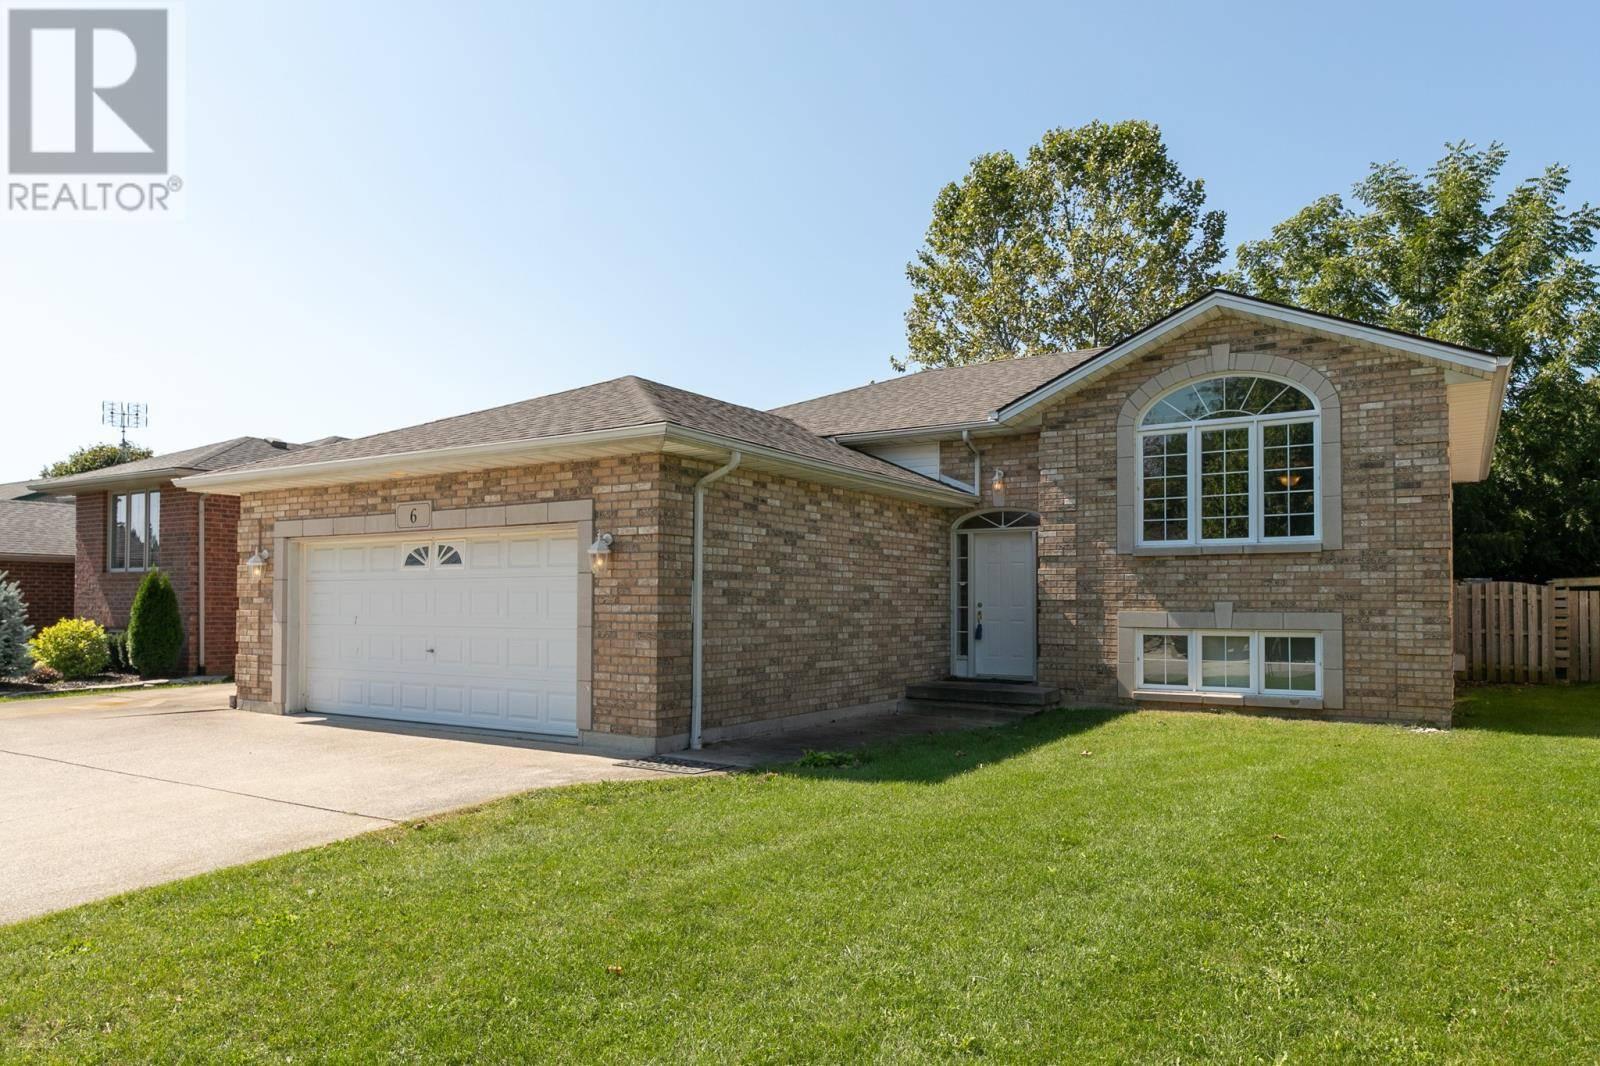 House for sale at 6 Shepley  Harrow Ontario - MLS: 19025590